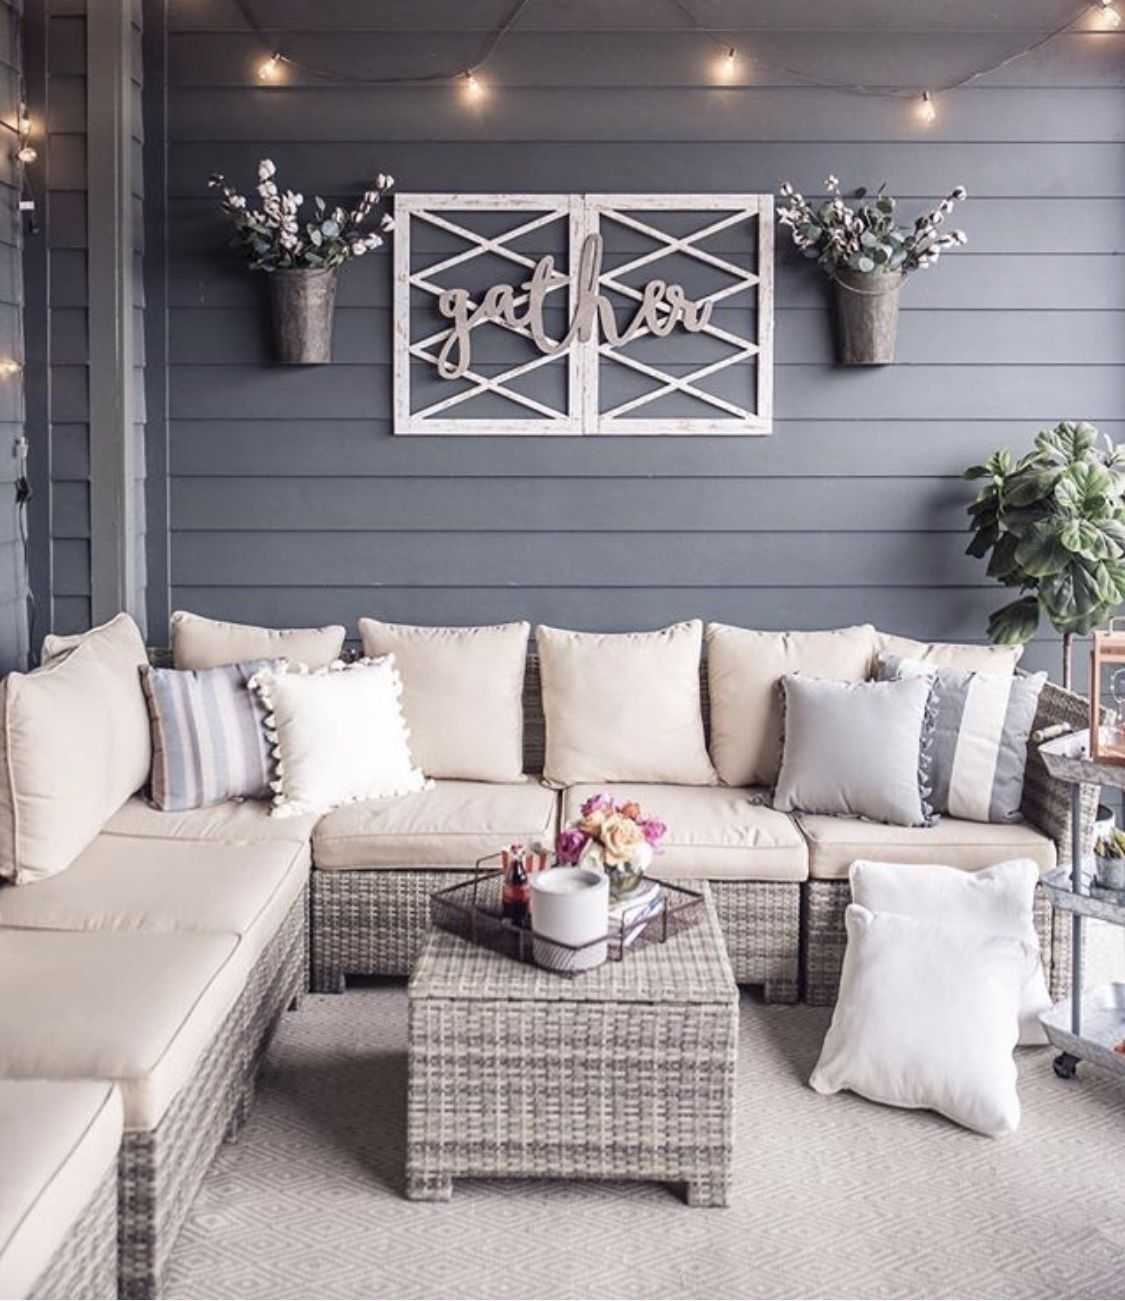 Cozy outdoor space | Patio furniture sets, Apartment patio ...